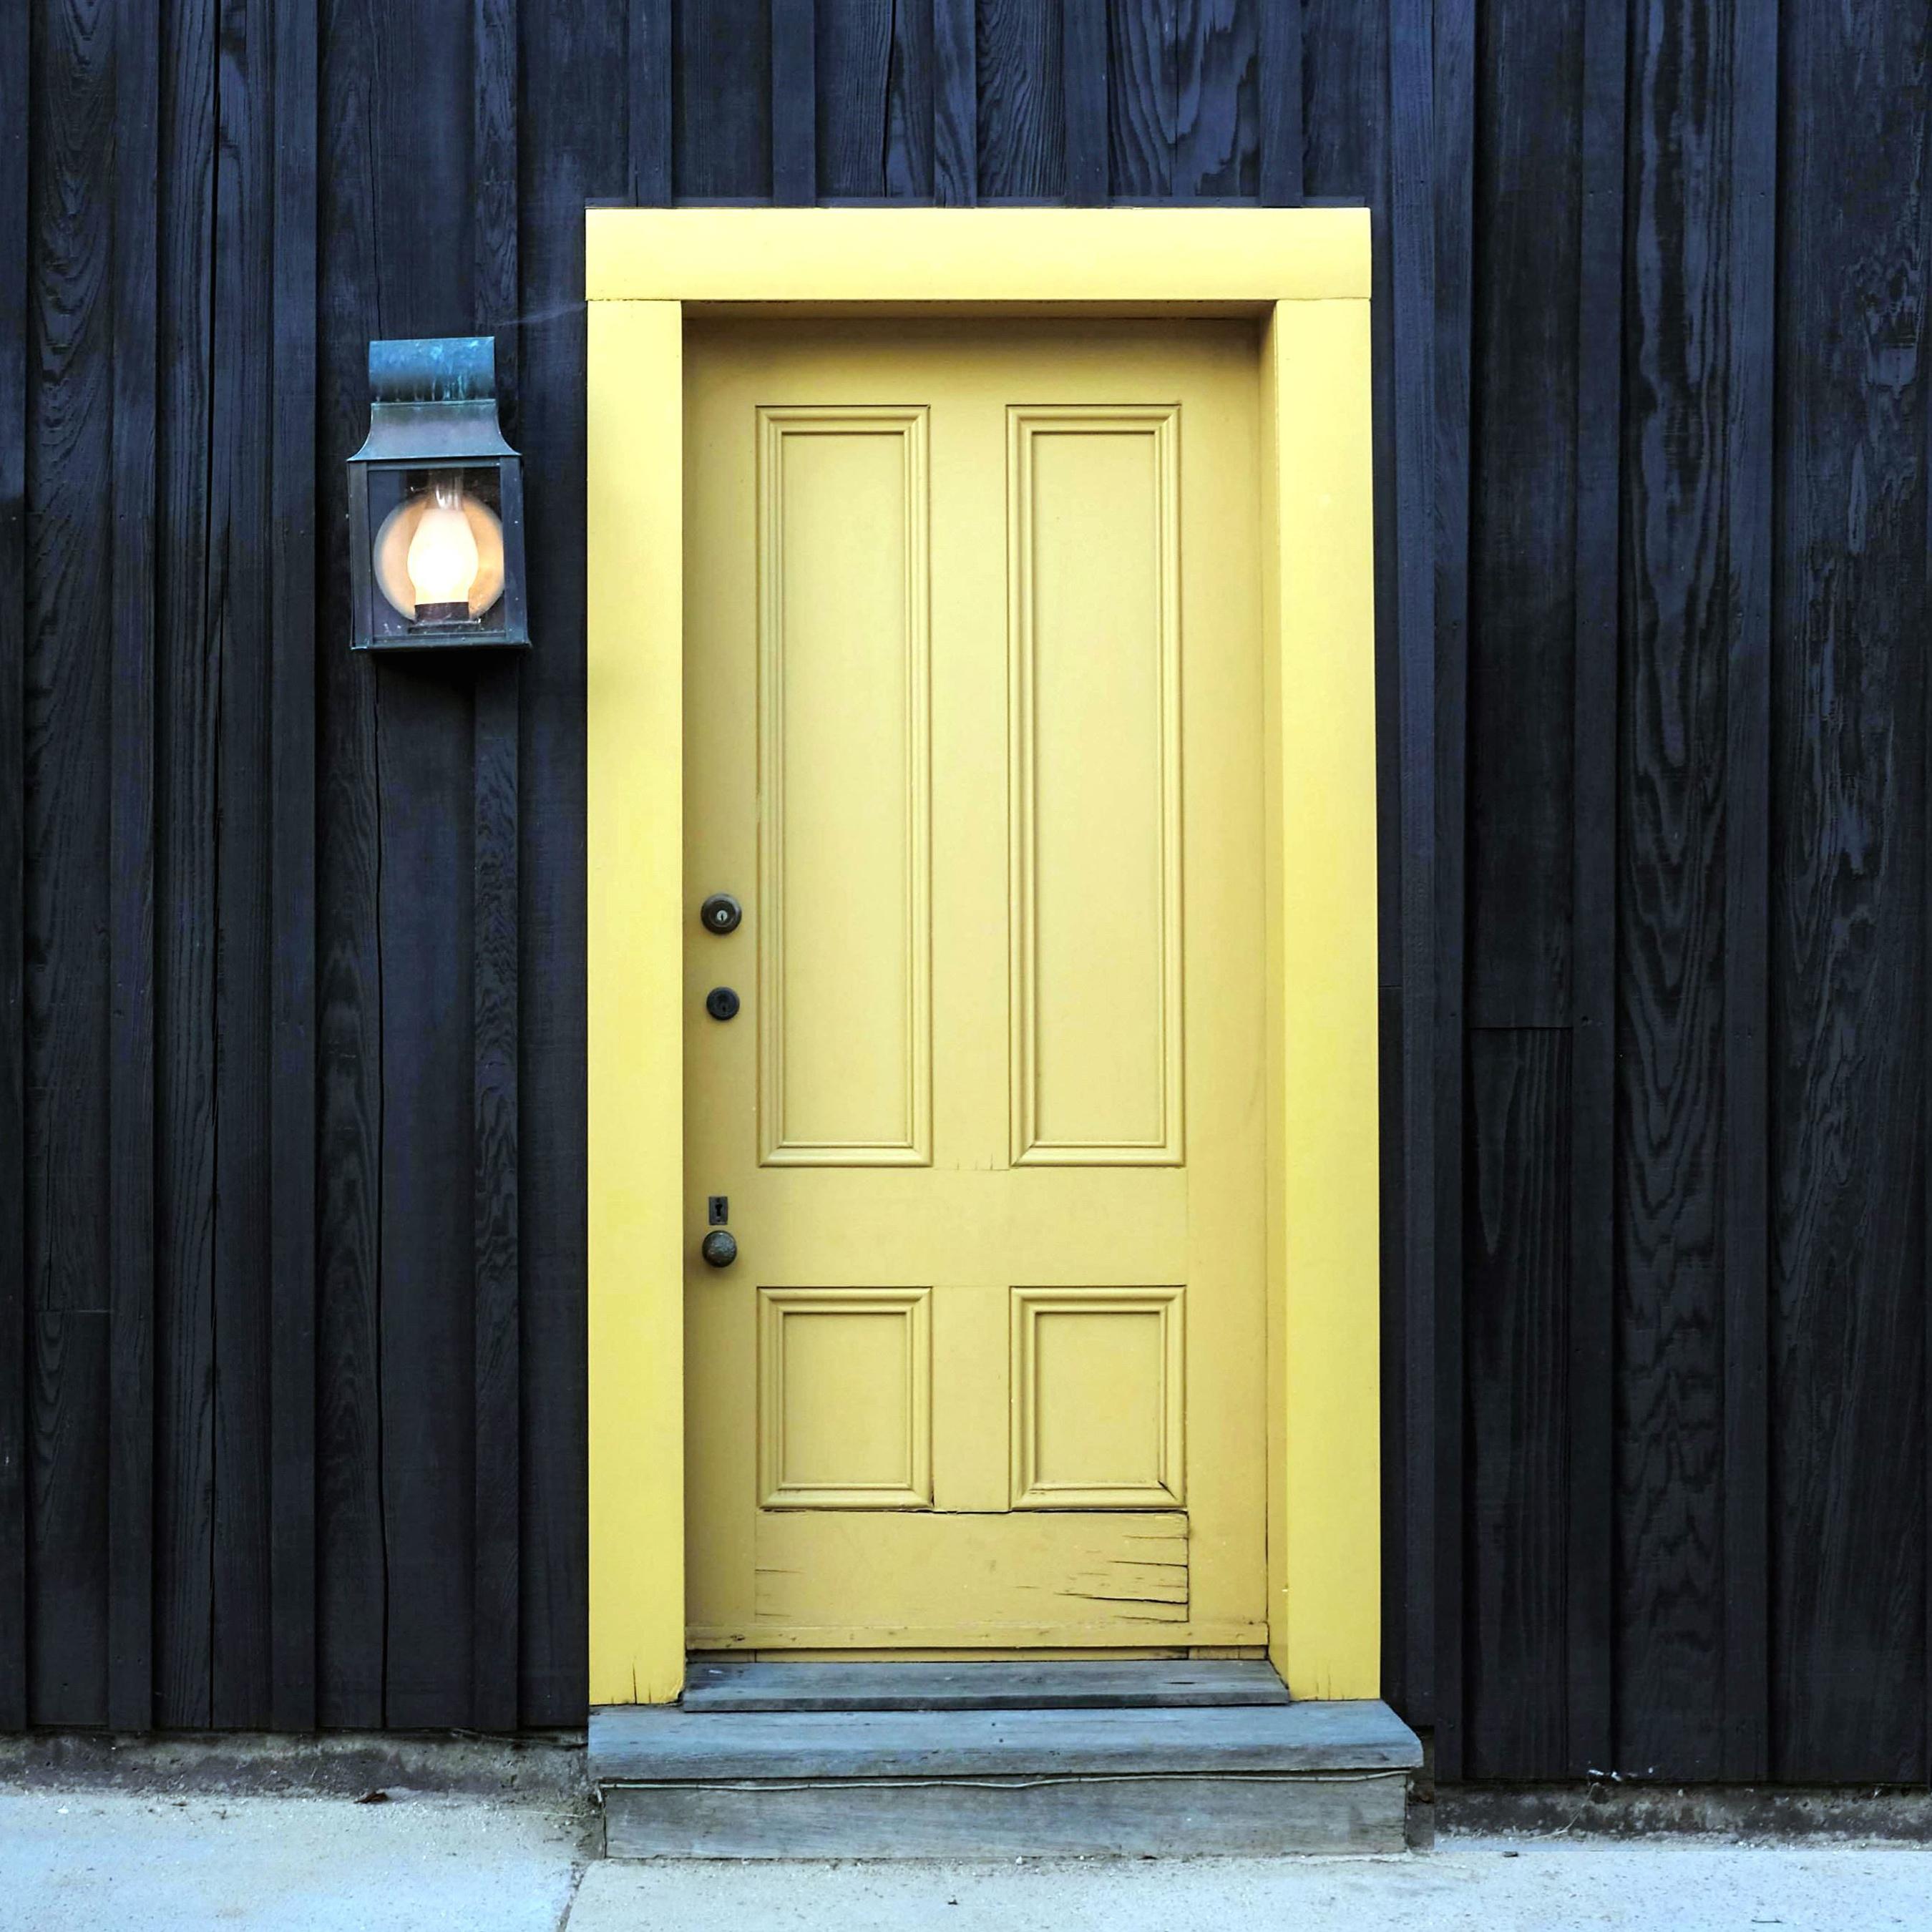 How Can You Unlock A Door Using A Magnet